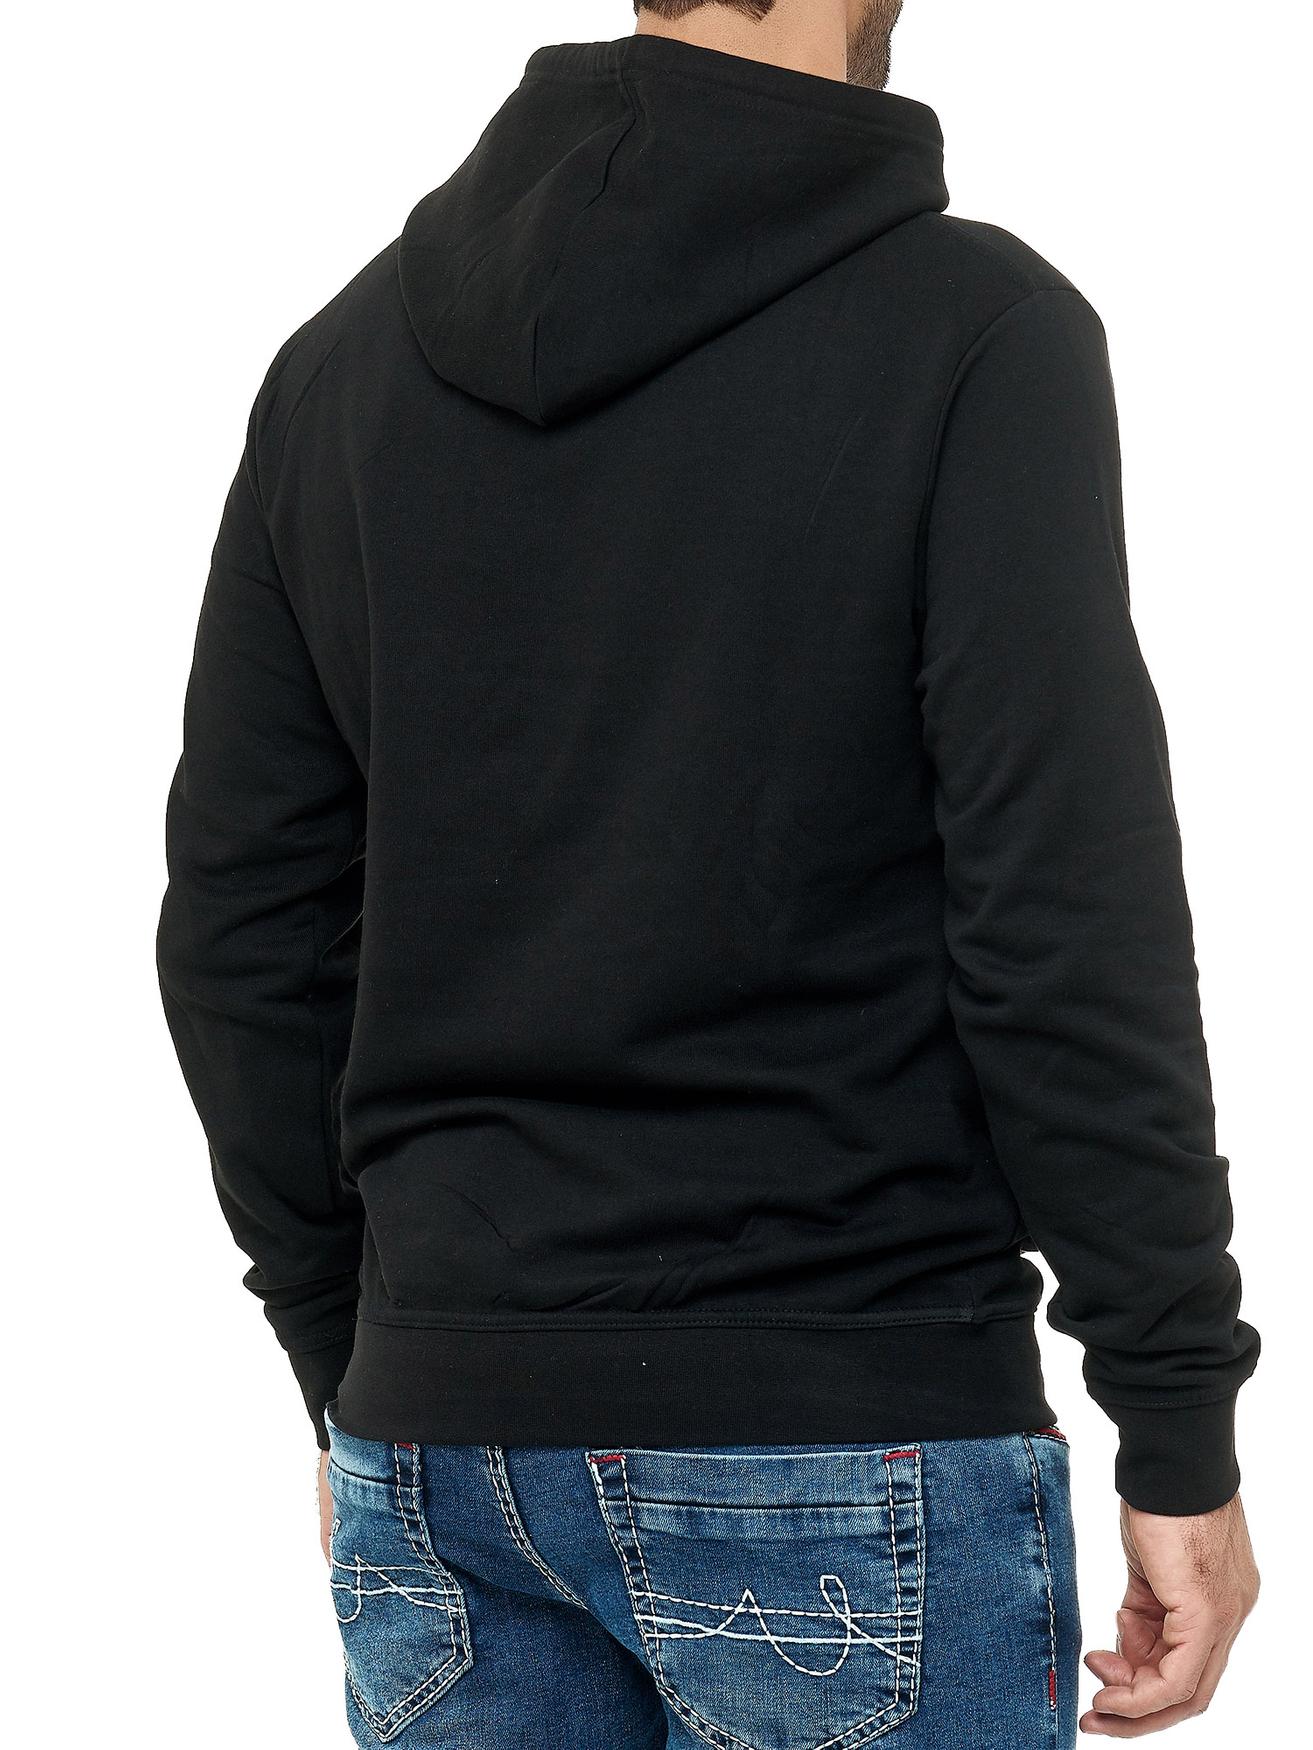 PROMODORO  Mens Hoody Jacket  Größe L schwarz